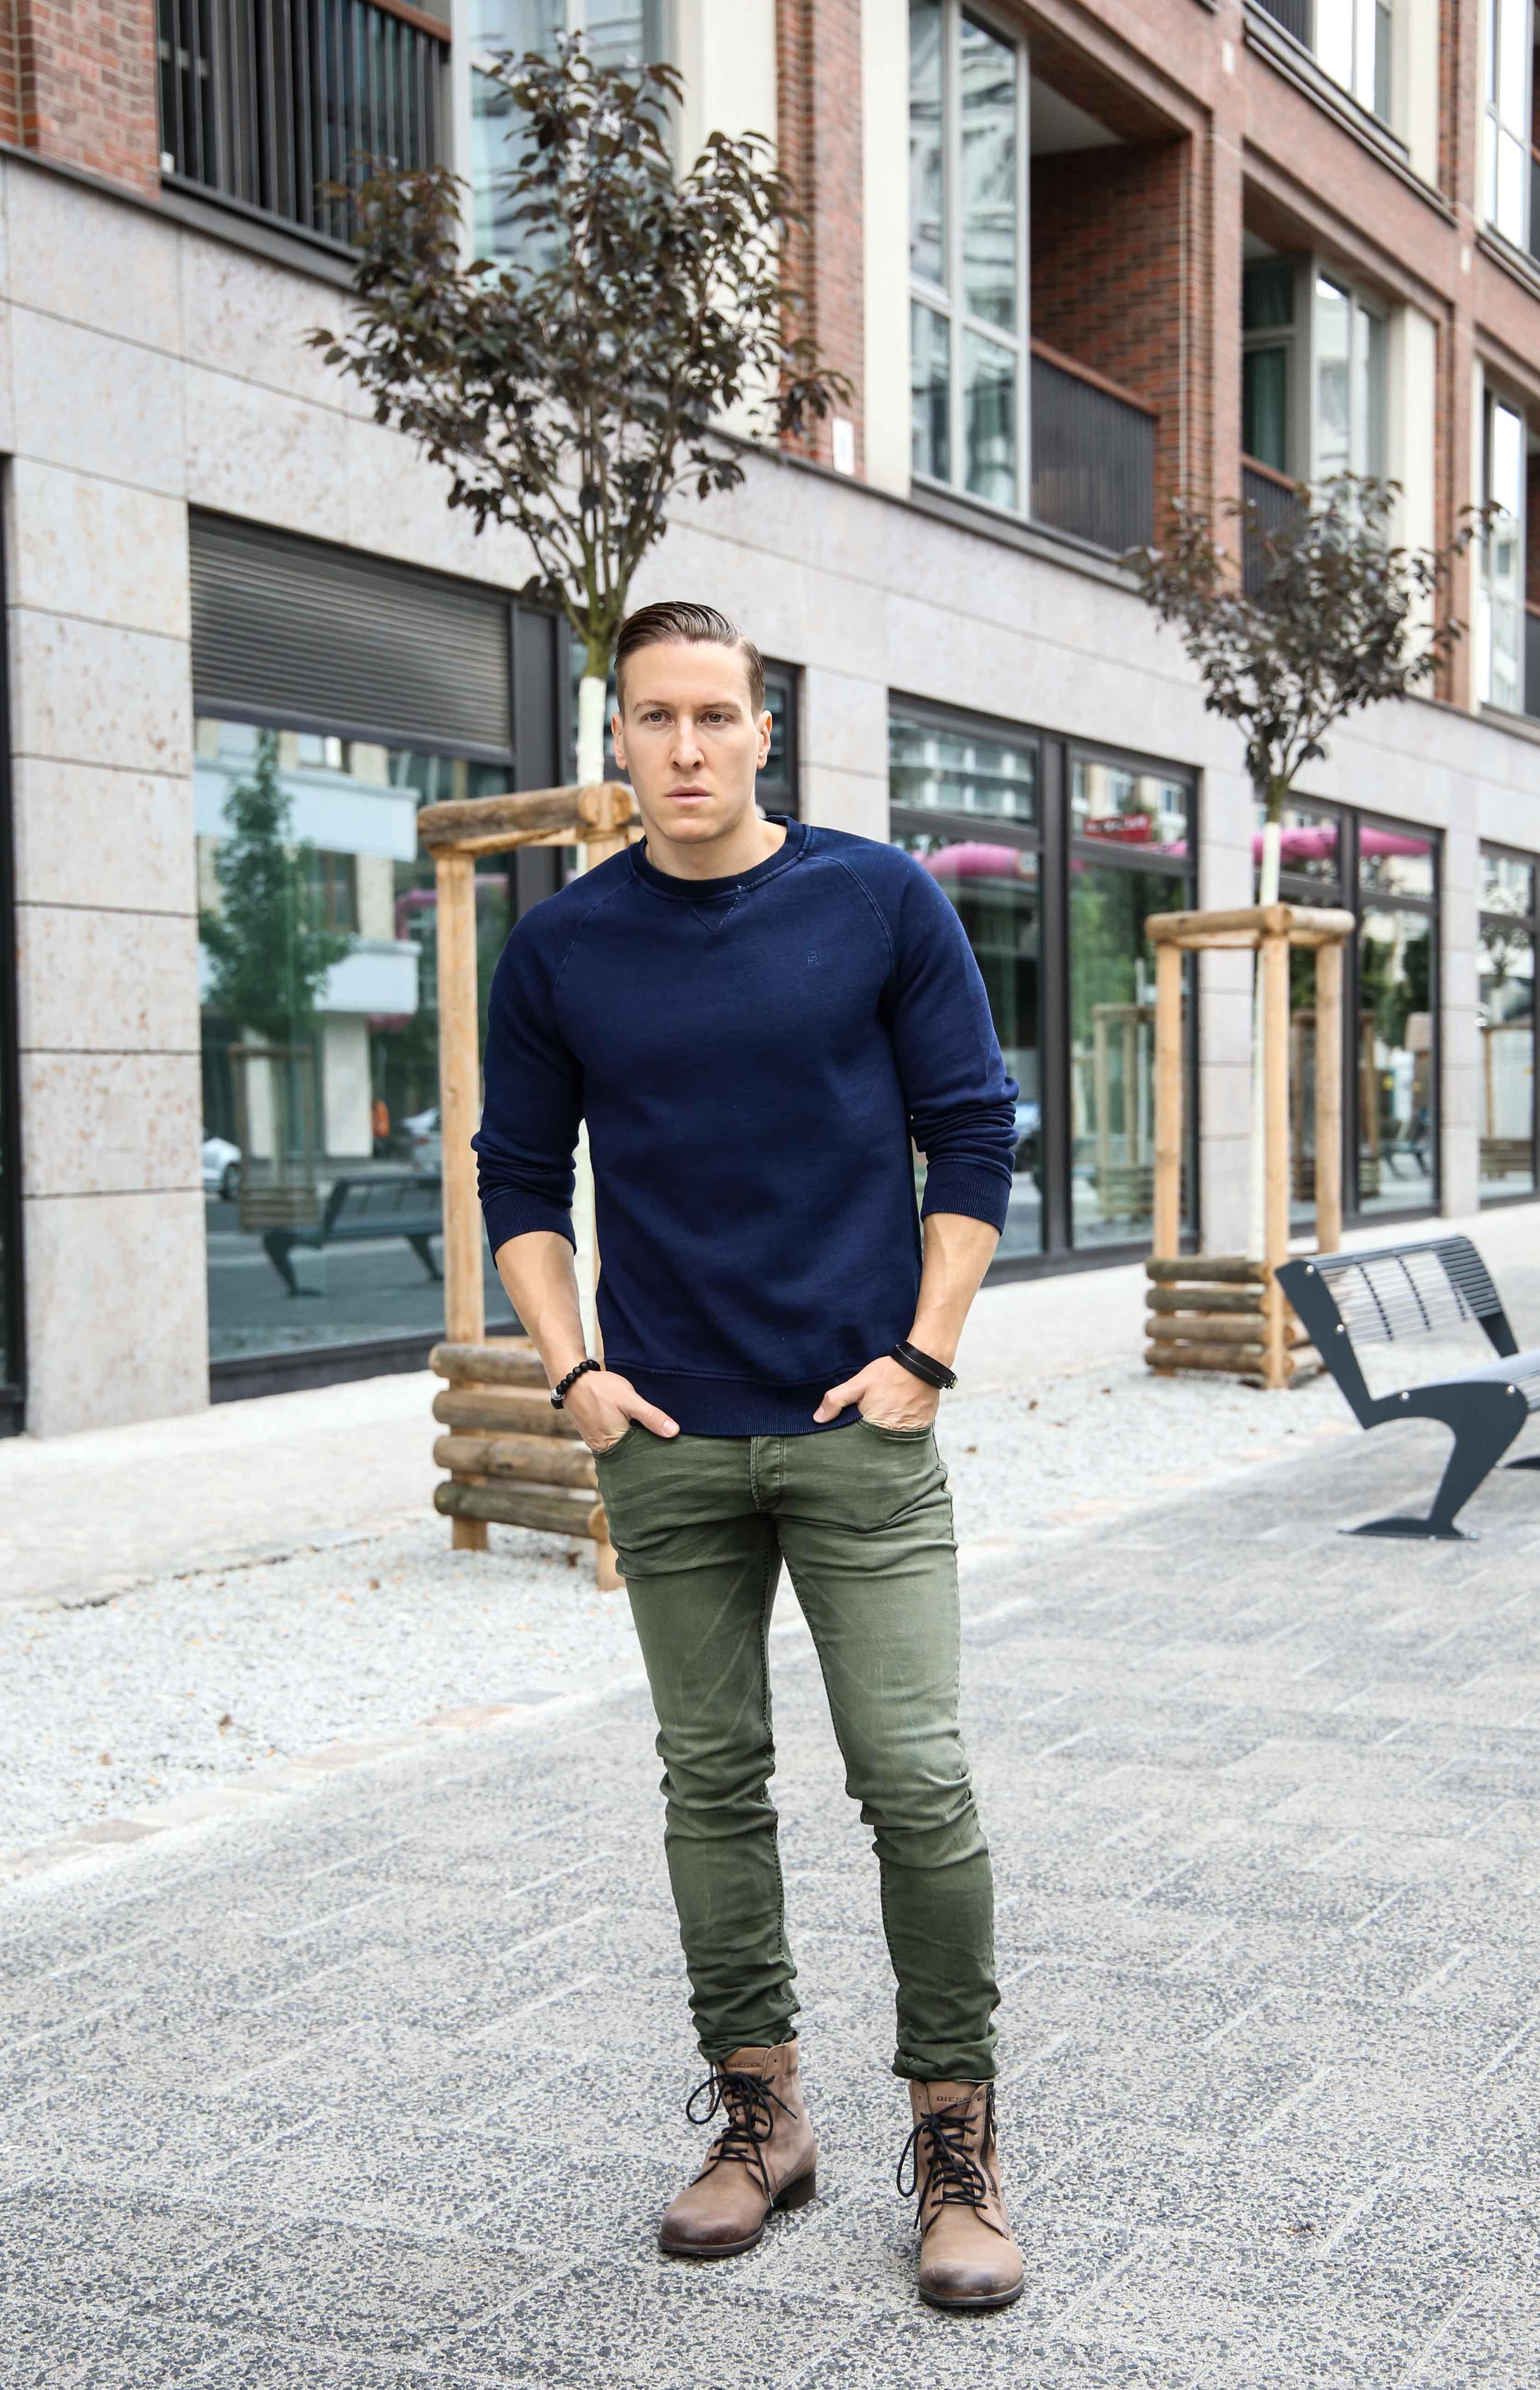 herbst-look-sweatshirt-indigo-blau-washed-skinny-jeans-grün-modeblog-männerblog-berlin_0024